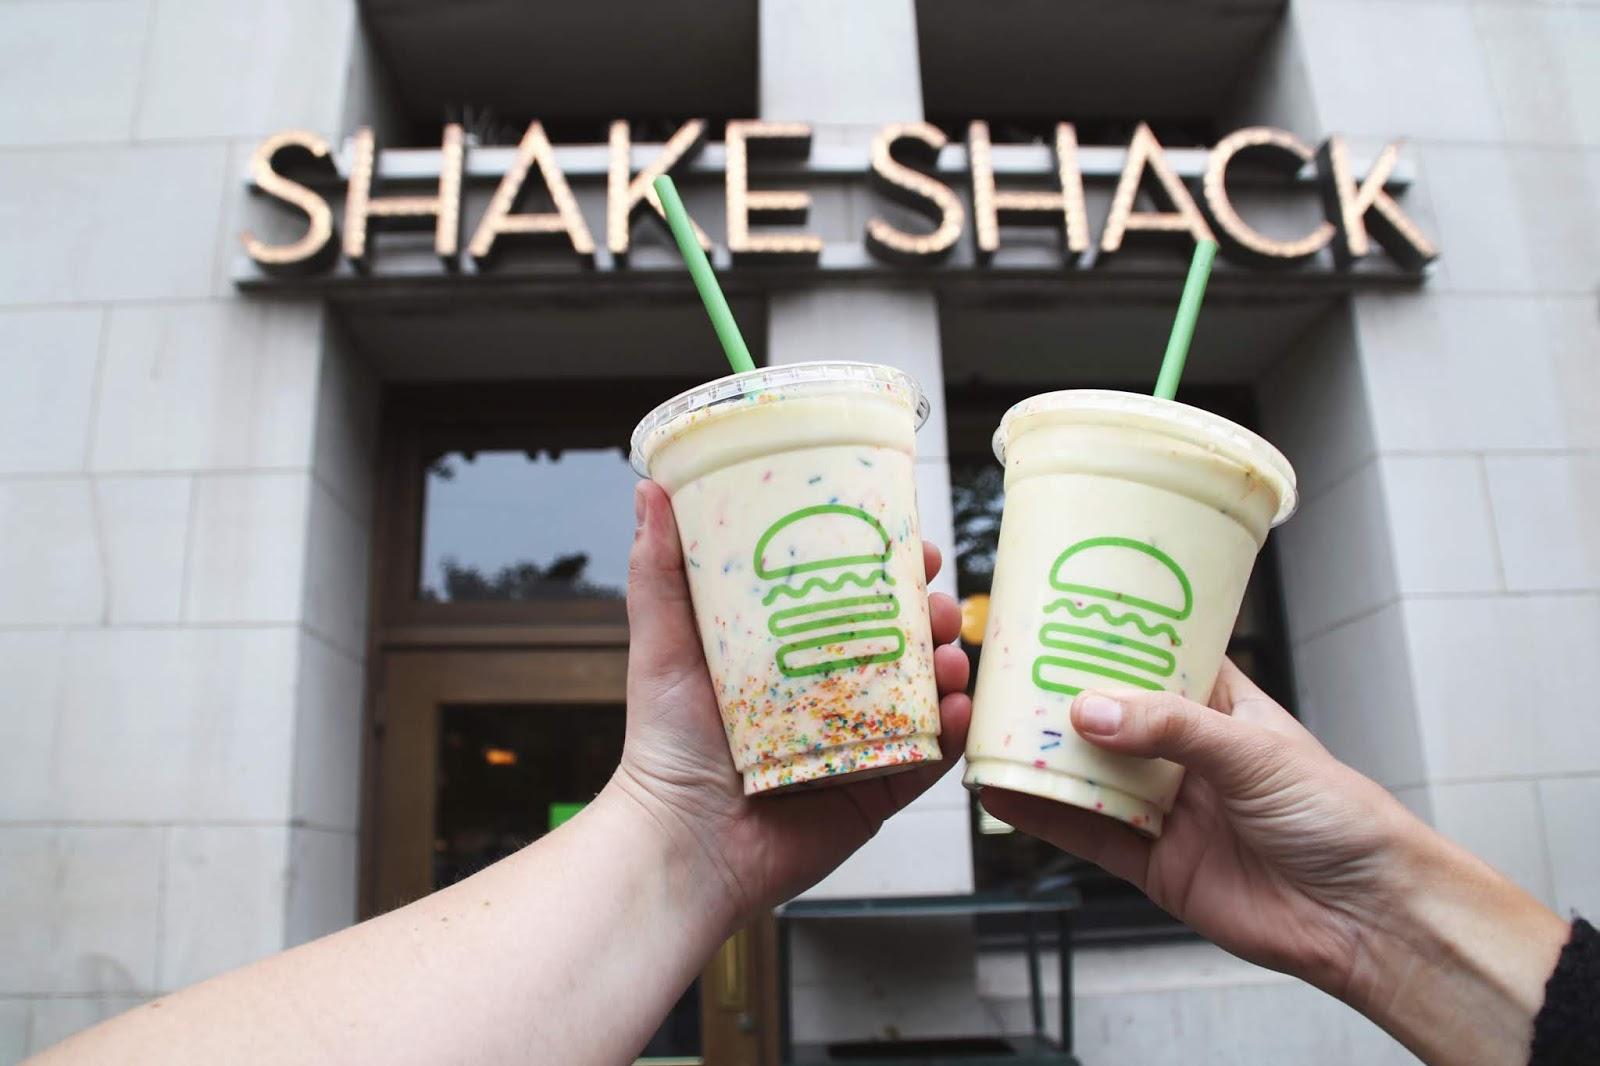 Shake Shack Chicago, pride month shake, shake shack shakes